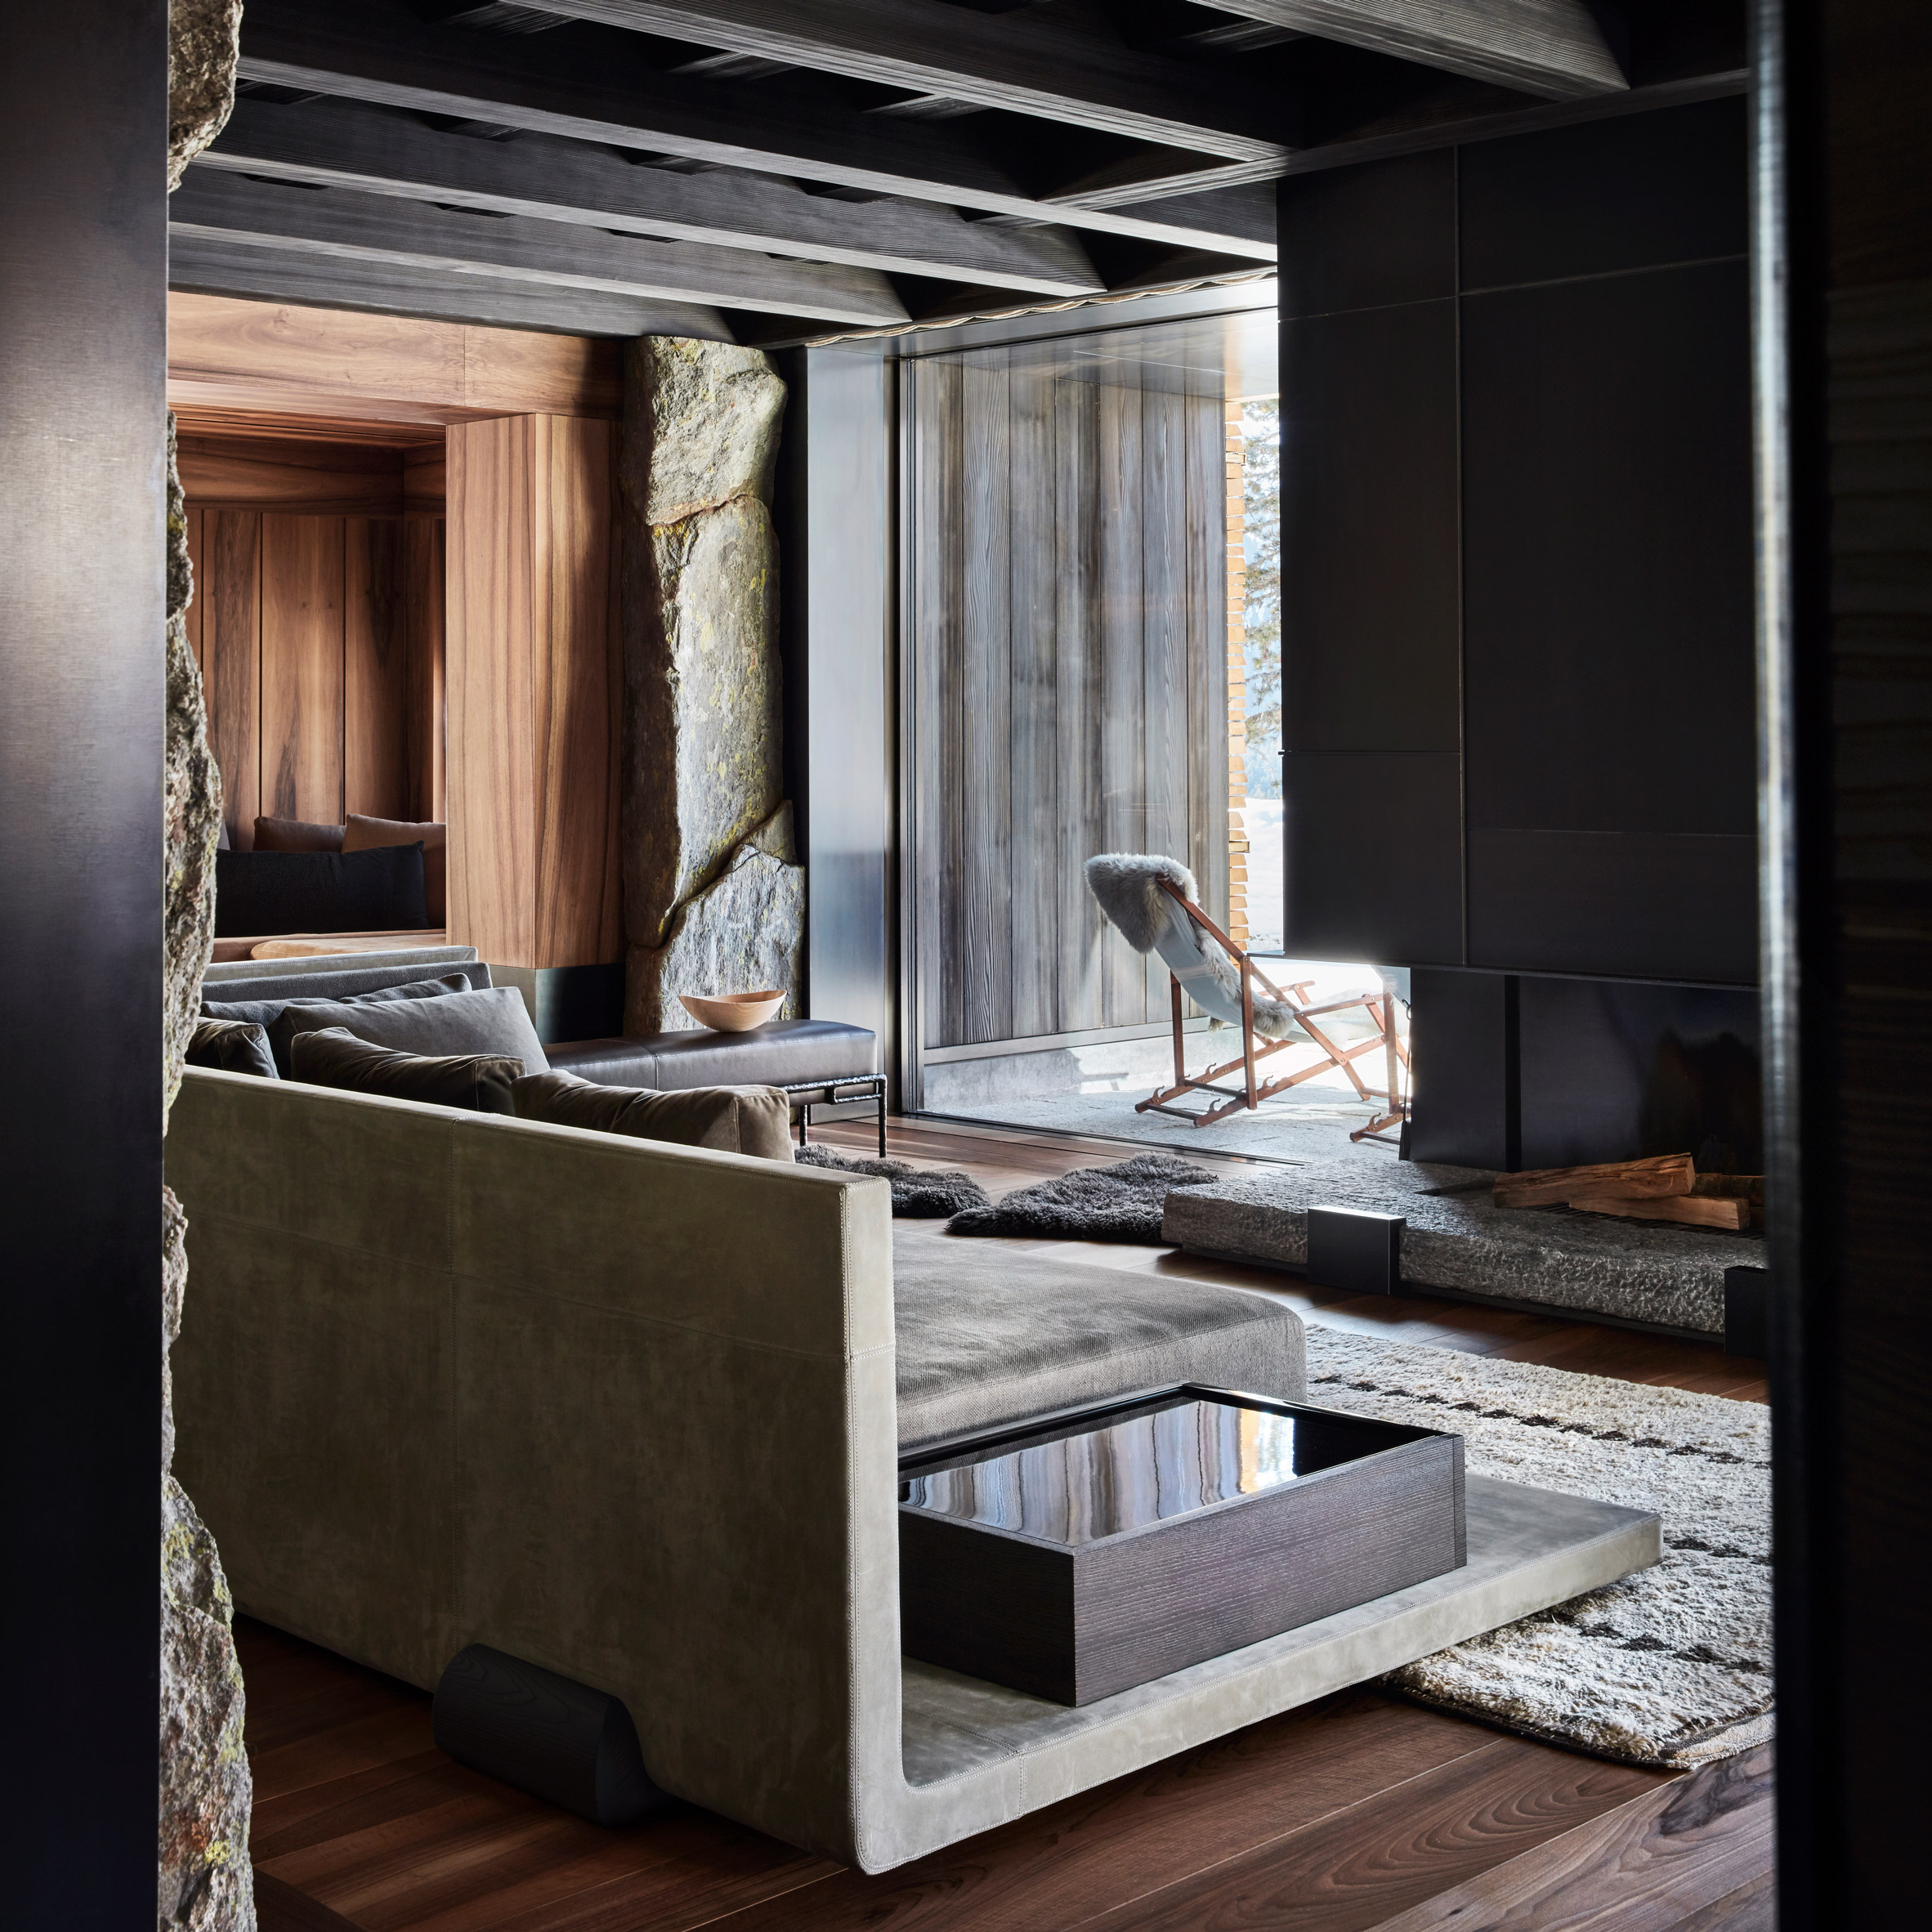 Luxury Villas Around The World By French Interiors Studio Liaigre